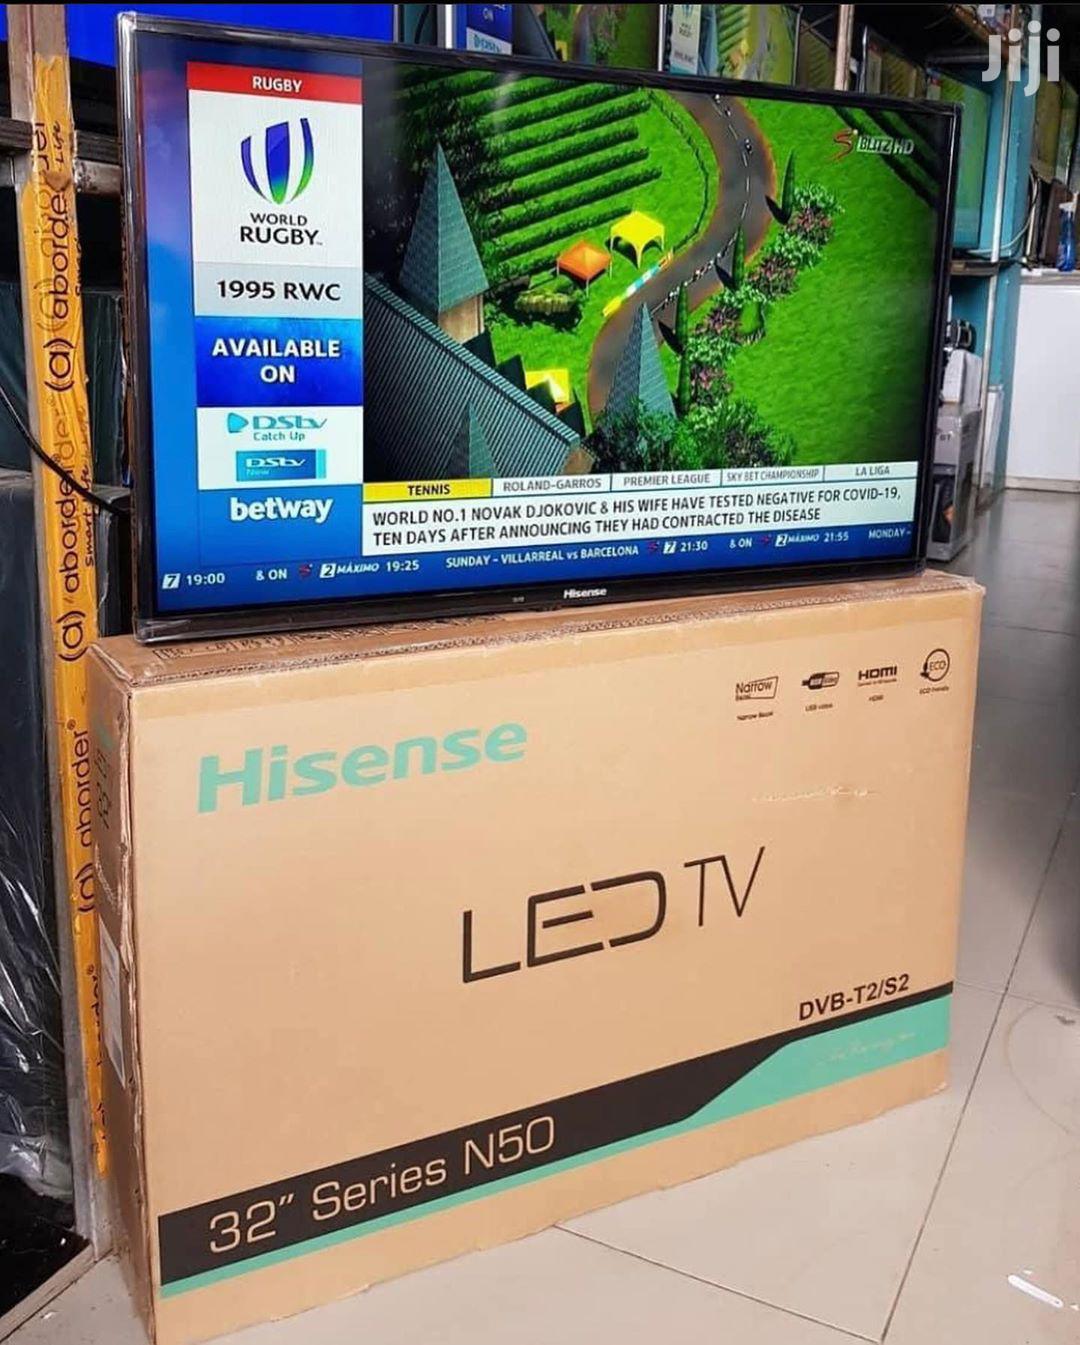 Hisense LED TV 32 Inches N50 Series